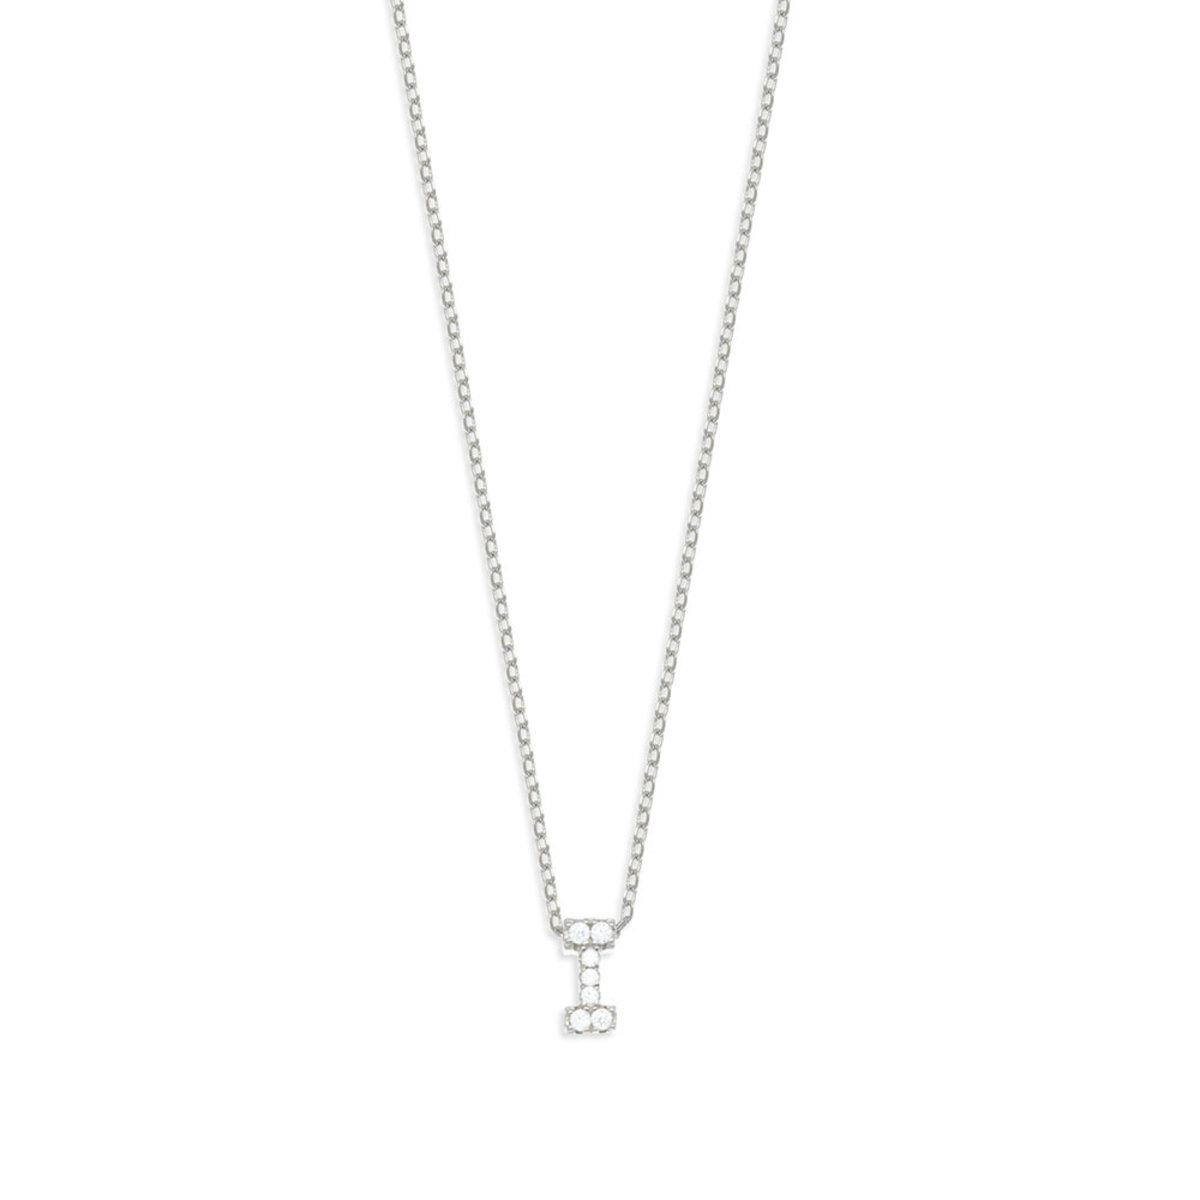 Silver Alphabets:925 silver,CZ stone necklace